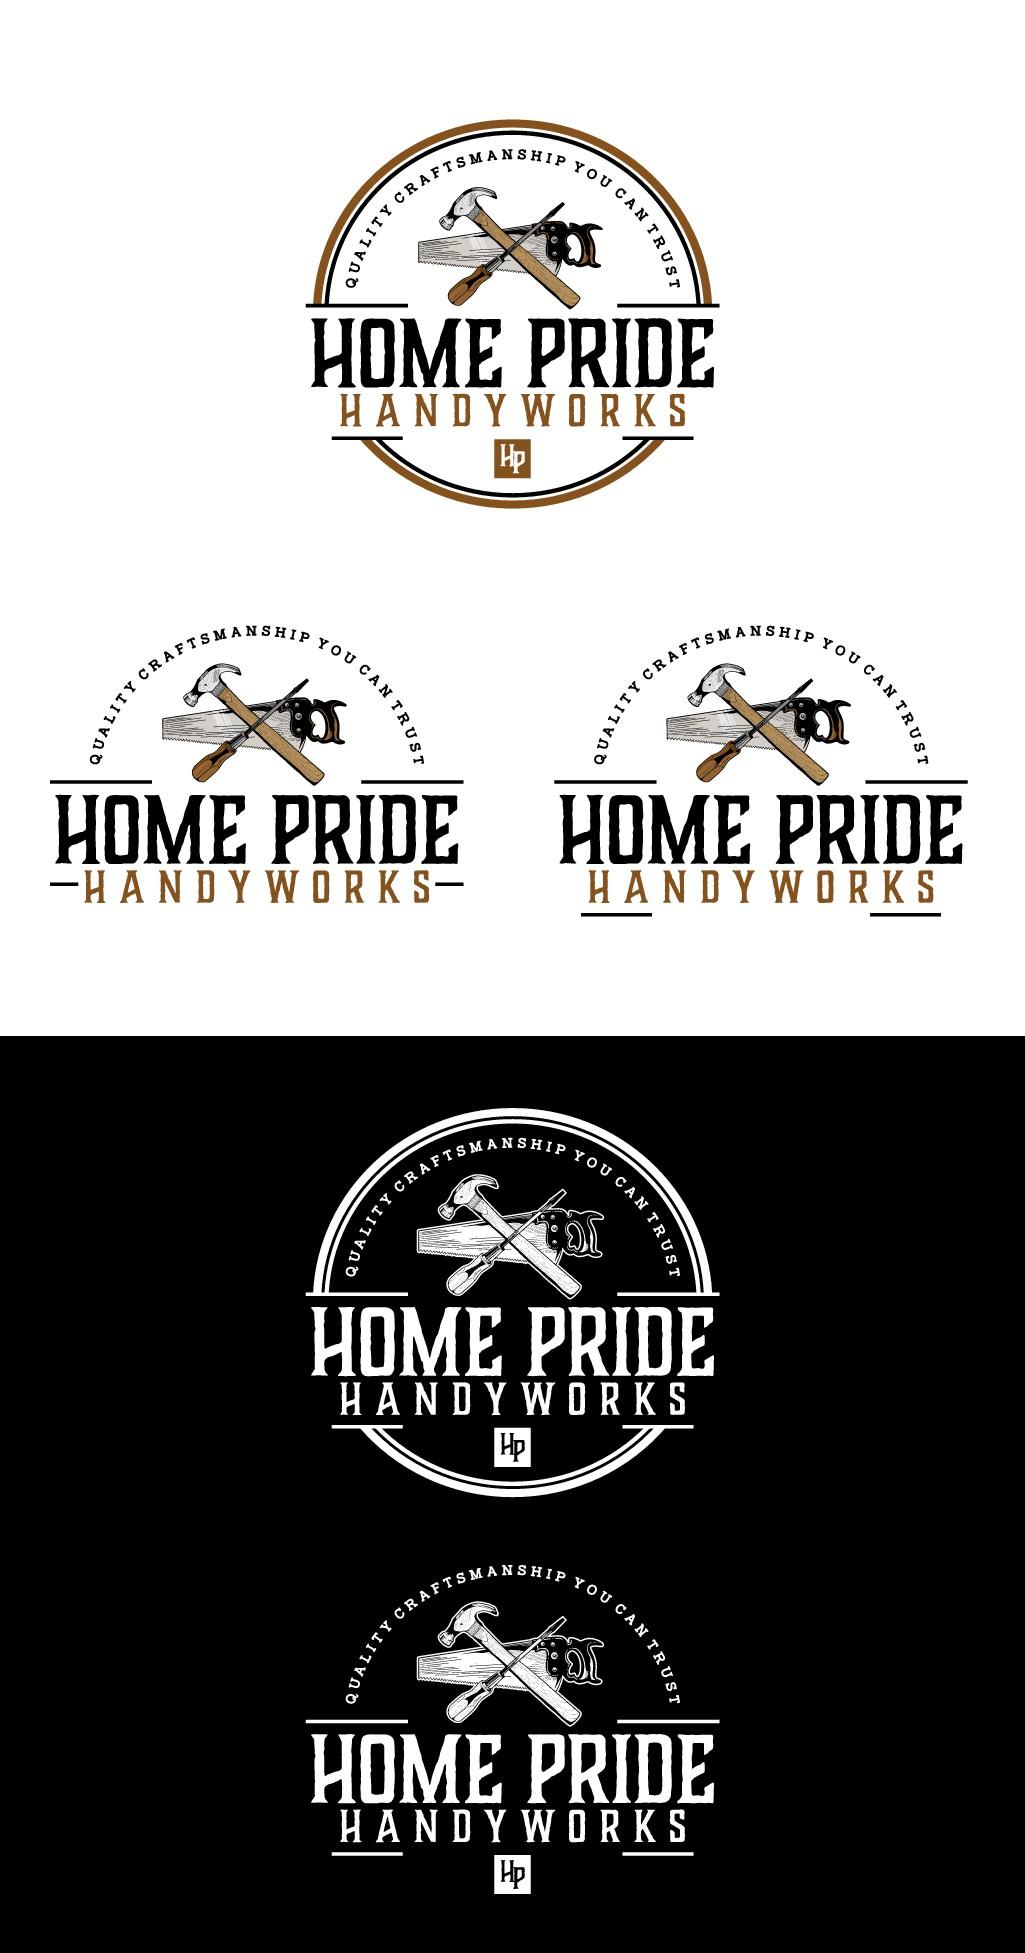 Design a vintage logo for a good old fashioned handyman business